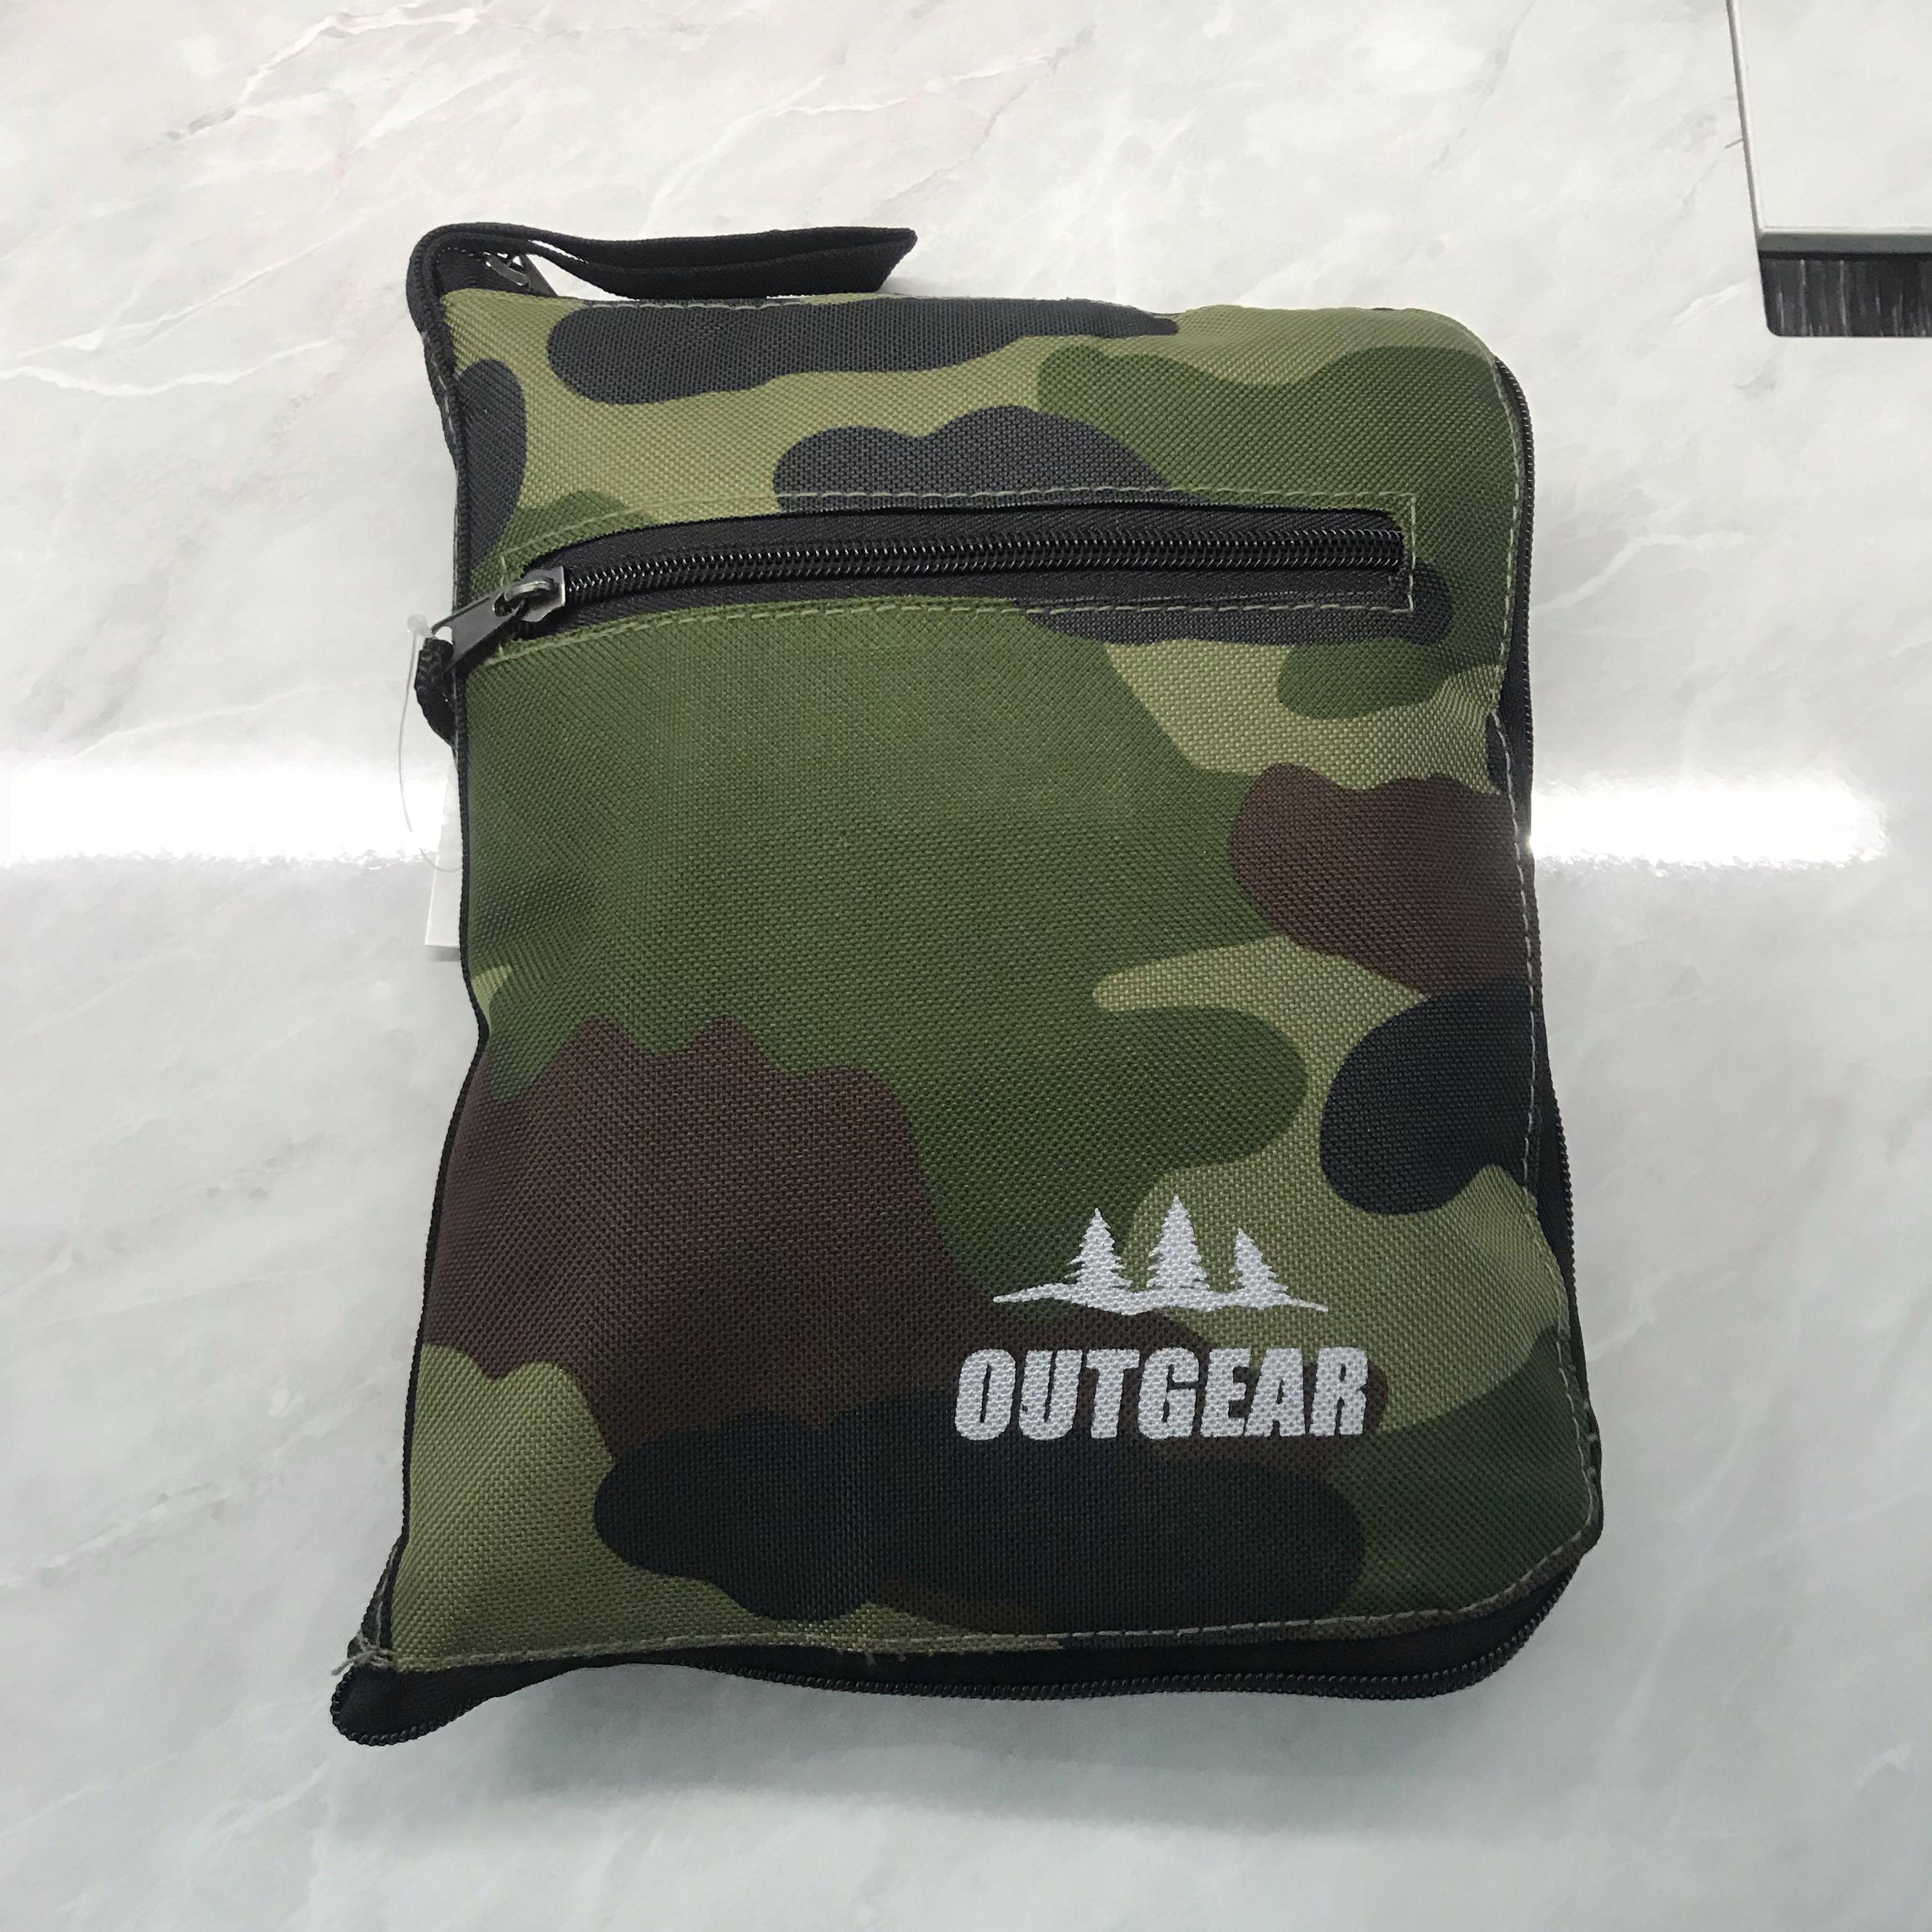 OUTGEAR Foldable Duffel Bag - porter medium bag